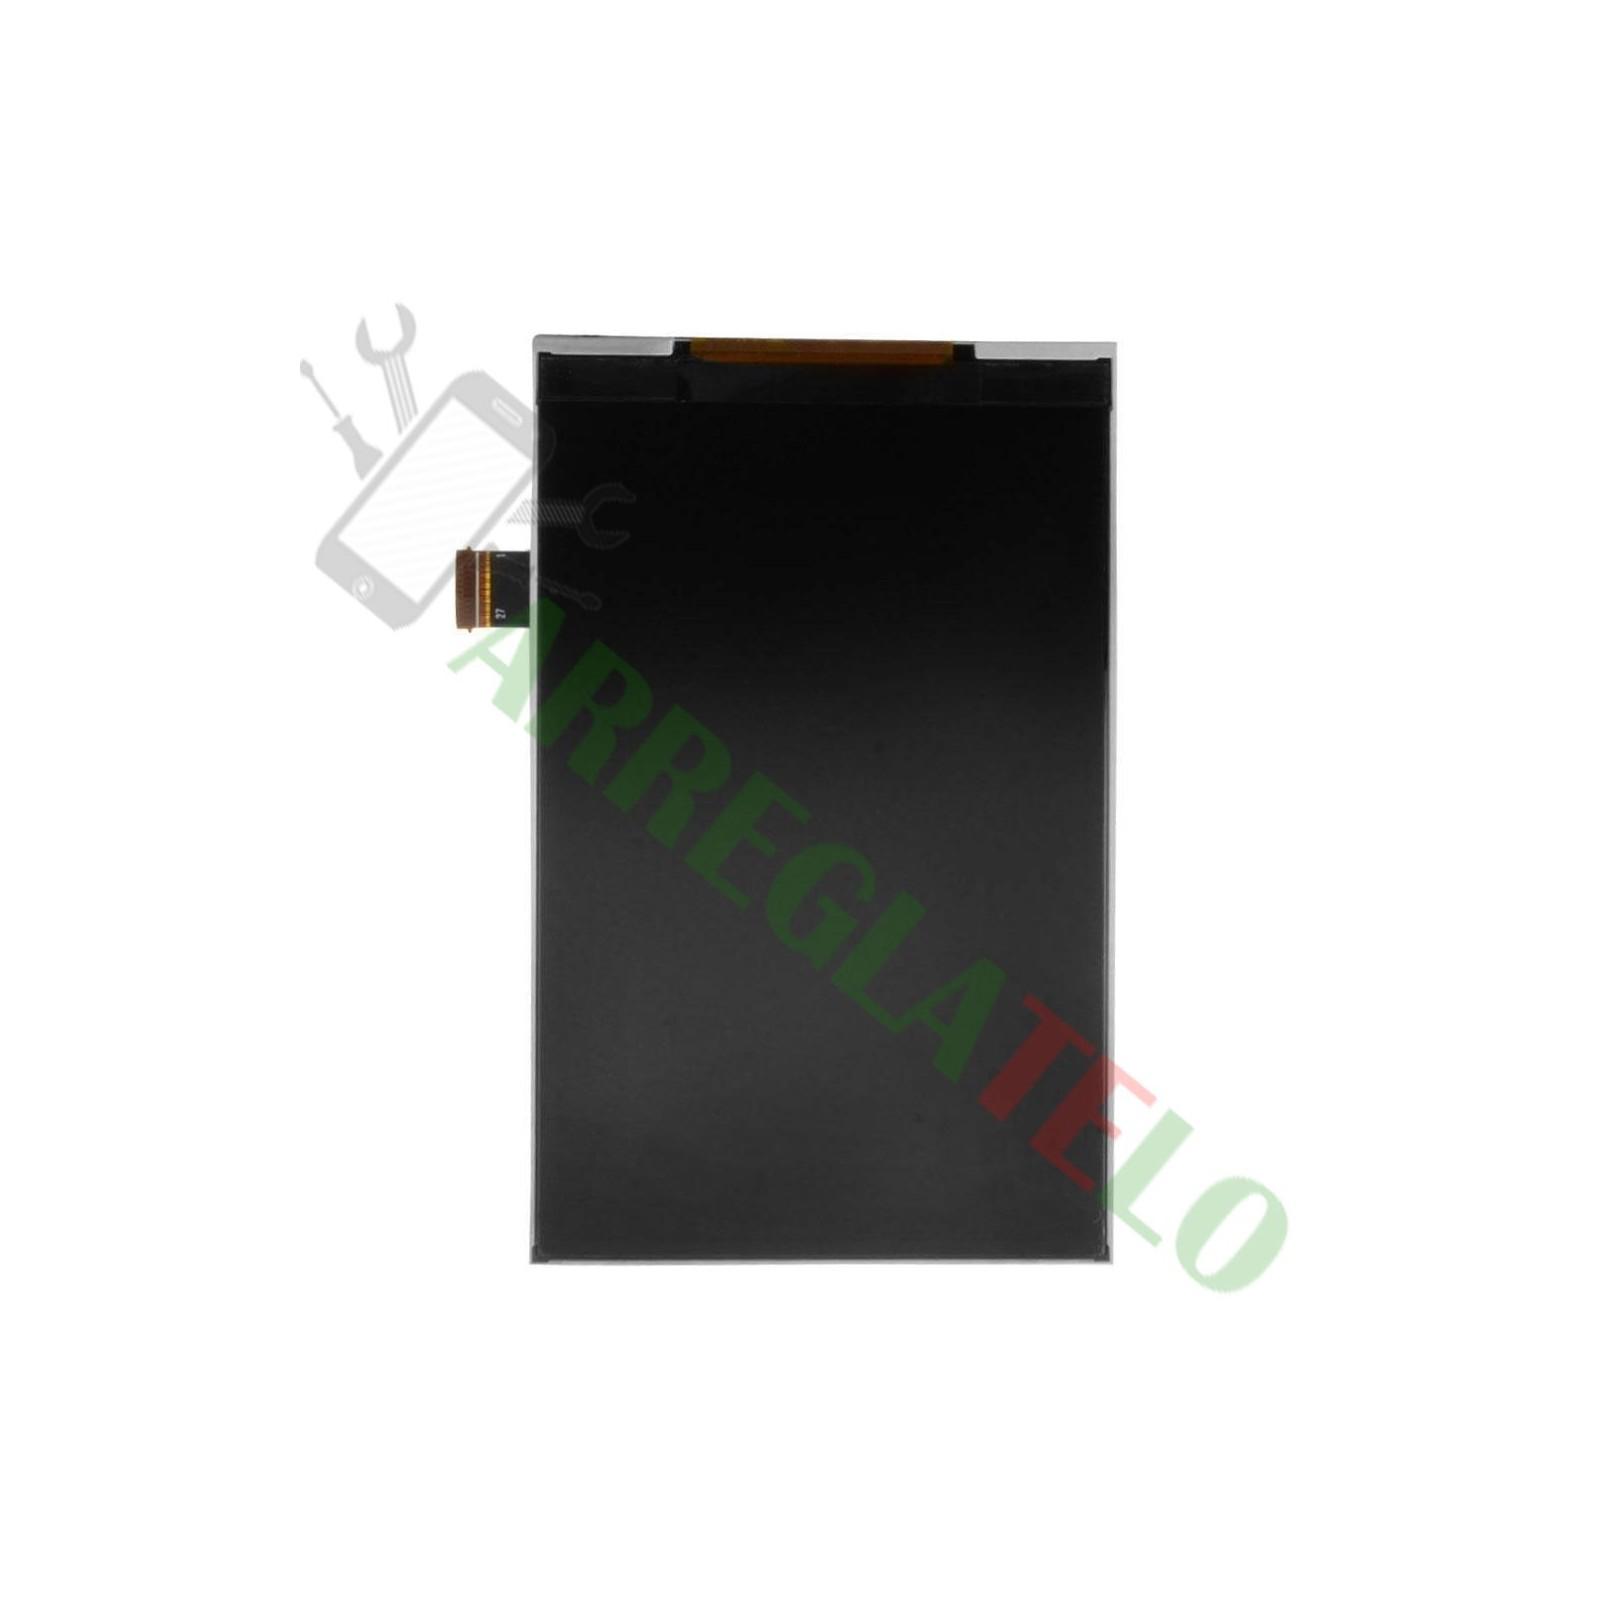 PANTALLA LCD DISPLAY ECRAN SCHERMO SONY E1 D2004 D2005 D2104 D2105 Sony - 1